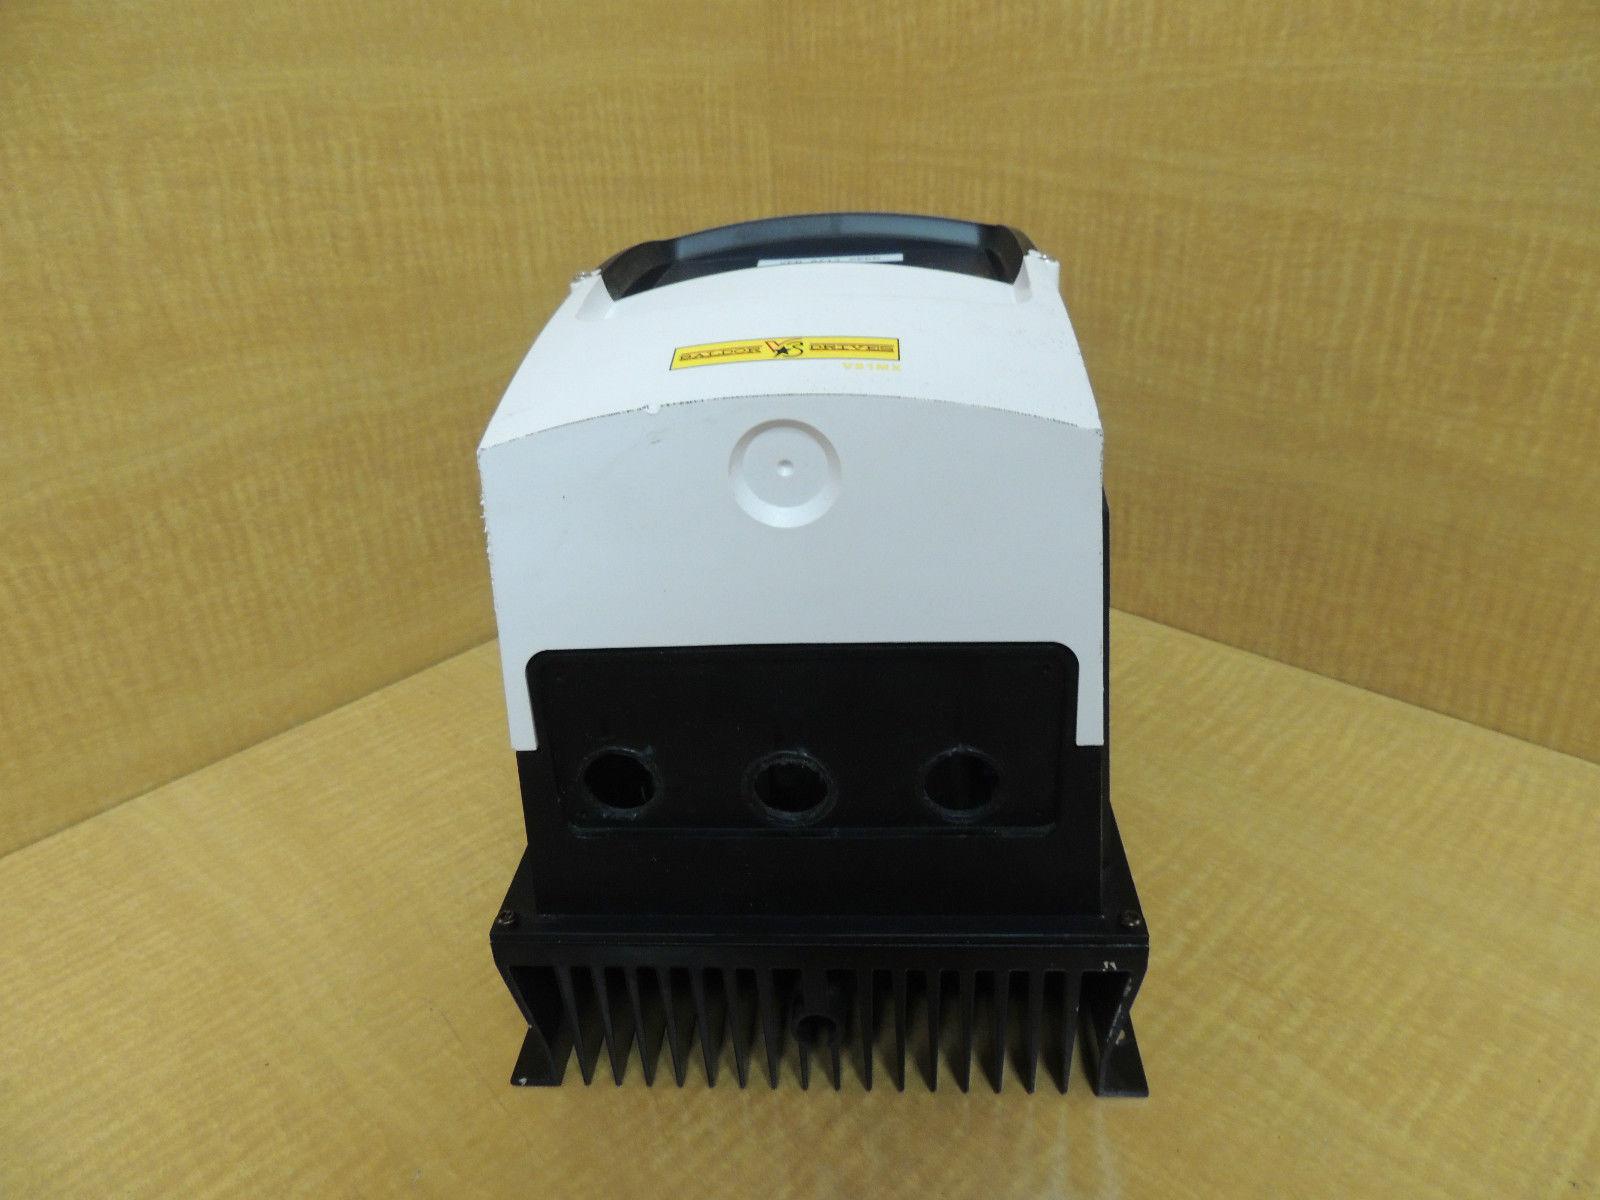 Used baldor vs1mx47 4t vs1mx474t vfd drive motor for Vfd for three phase motor